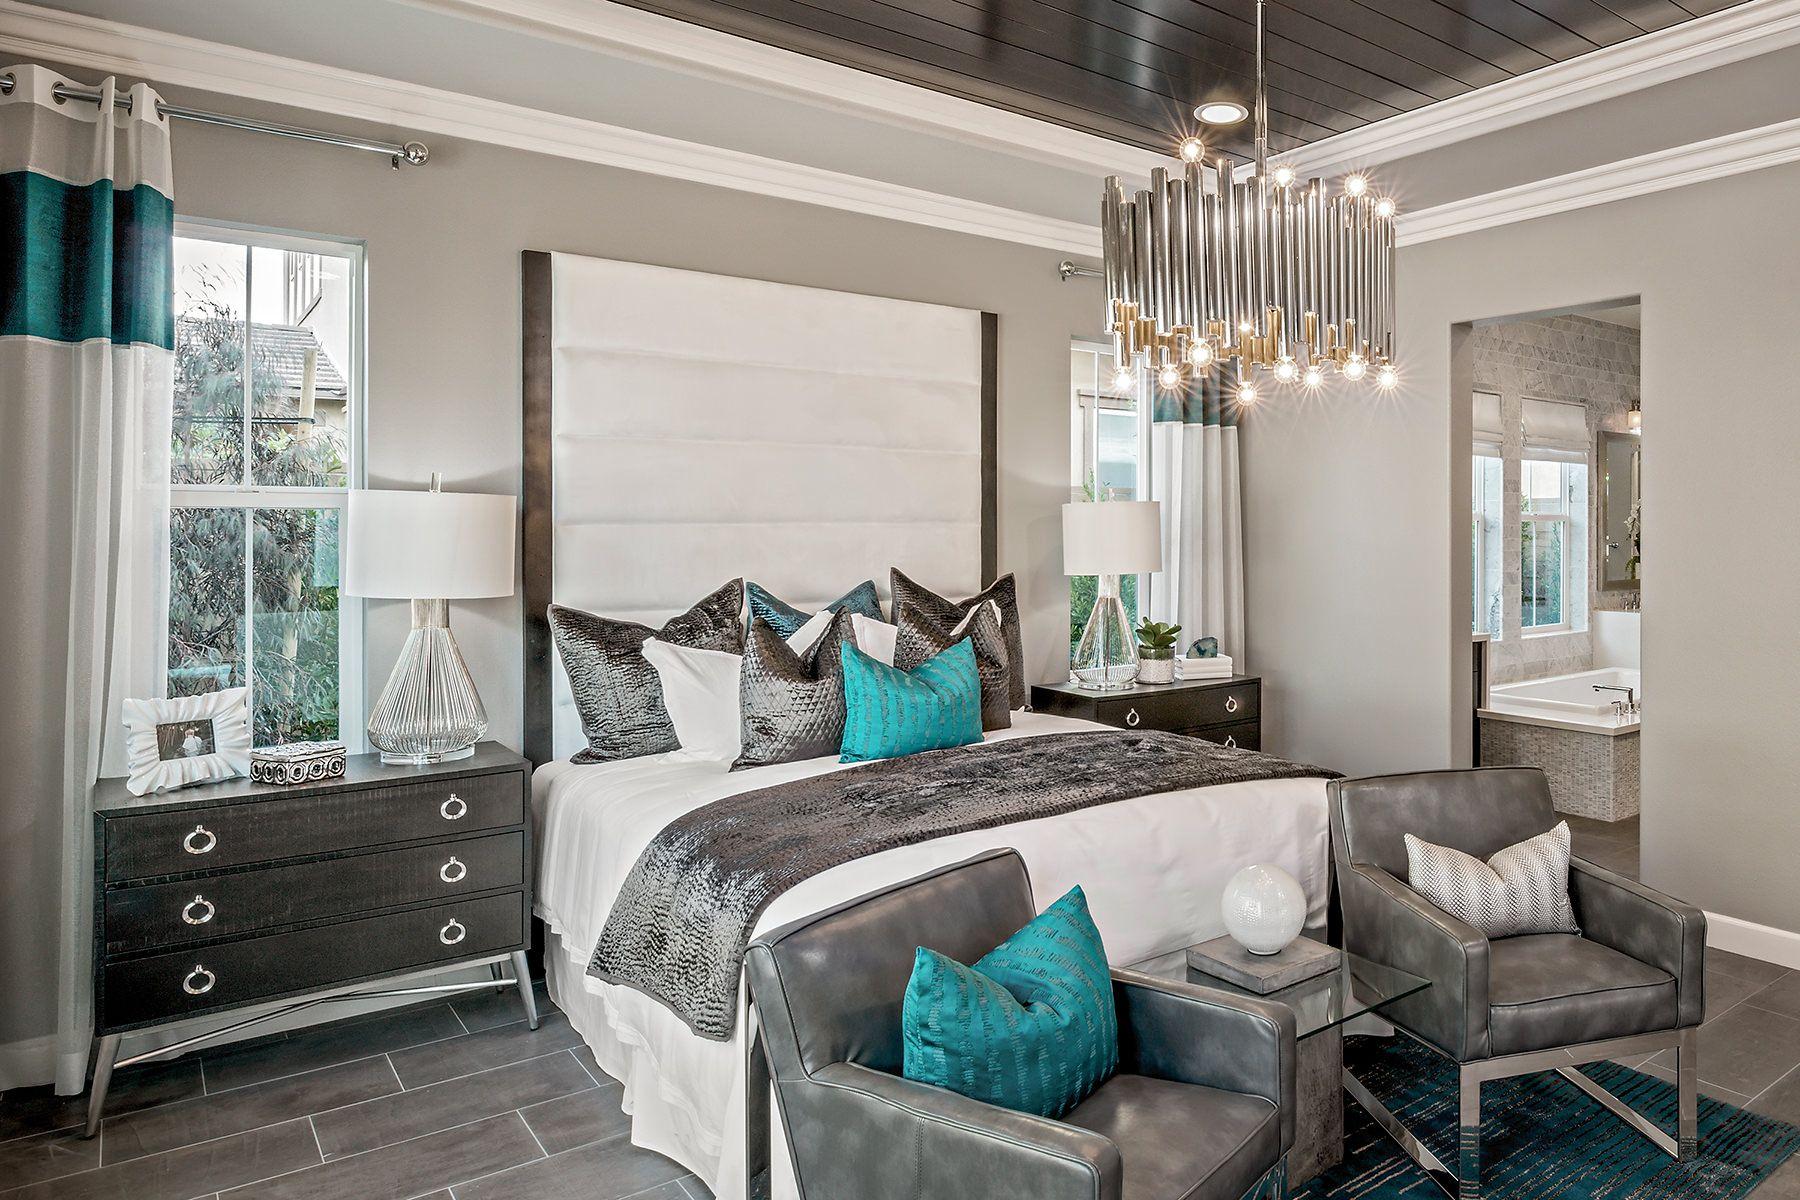 Ambrosia Interior Design Interior Design Awesome Bedrooms Interior